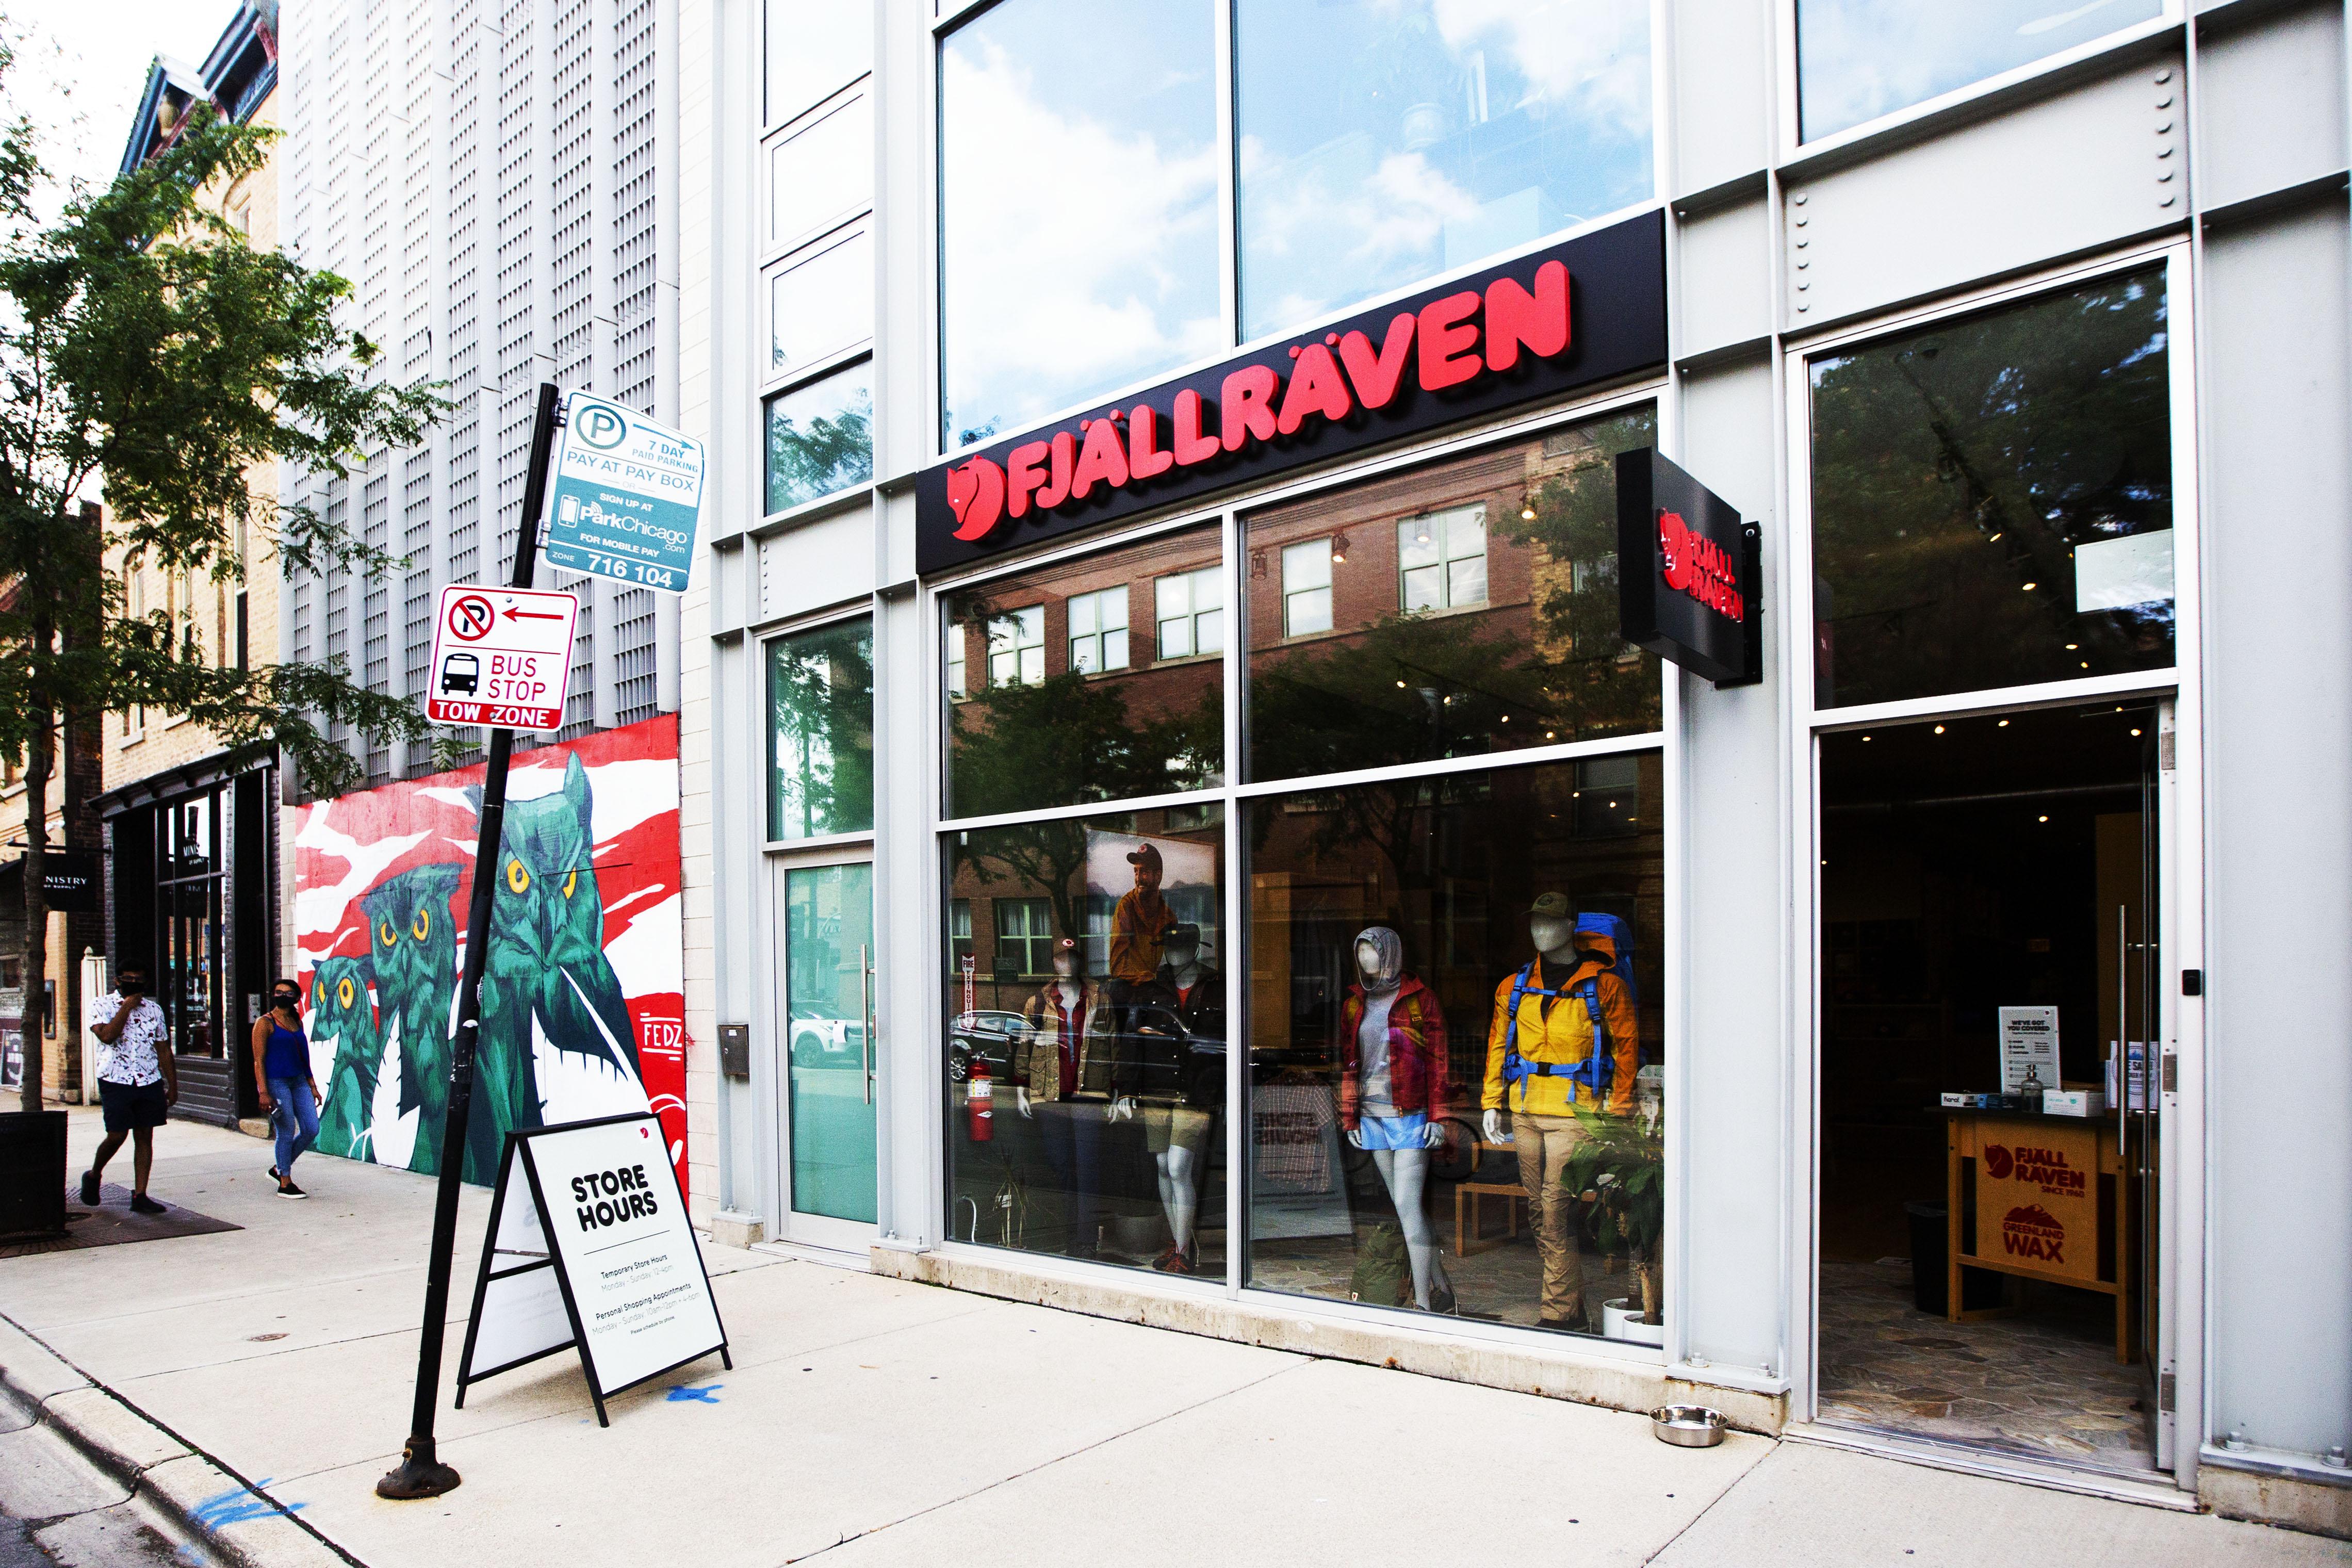 Fjallraven retailer in Chicago, Illinois